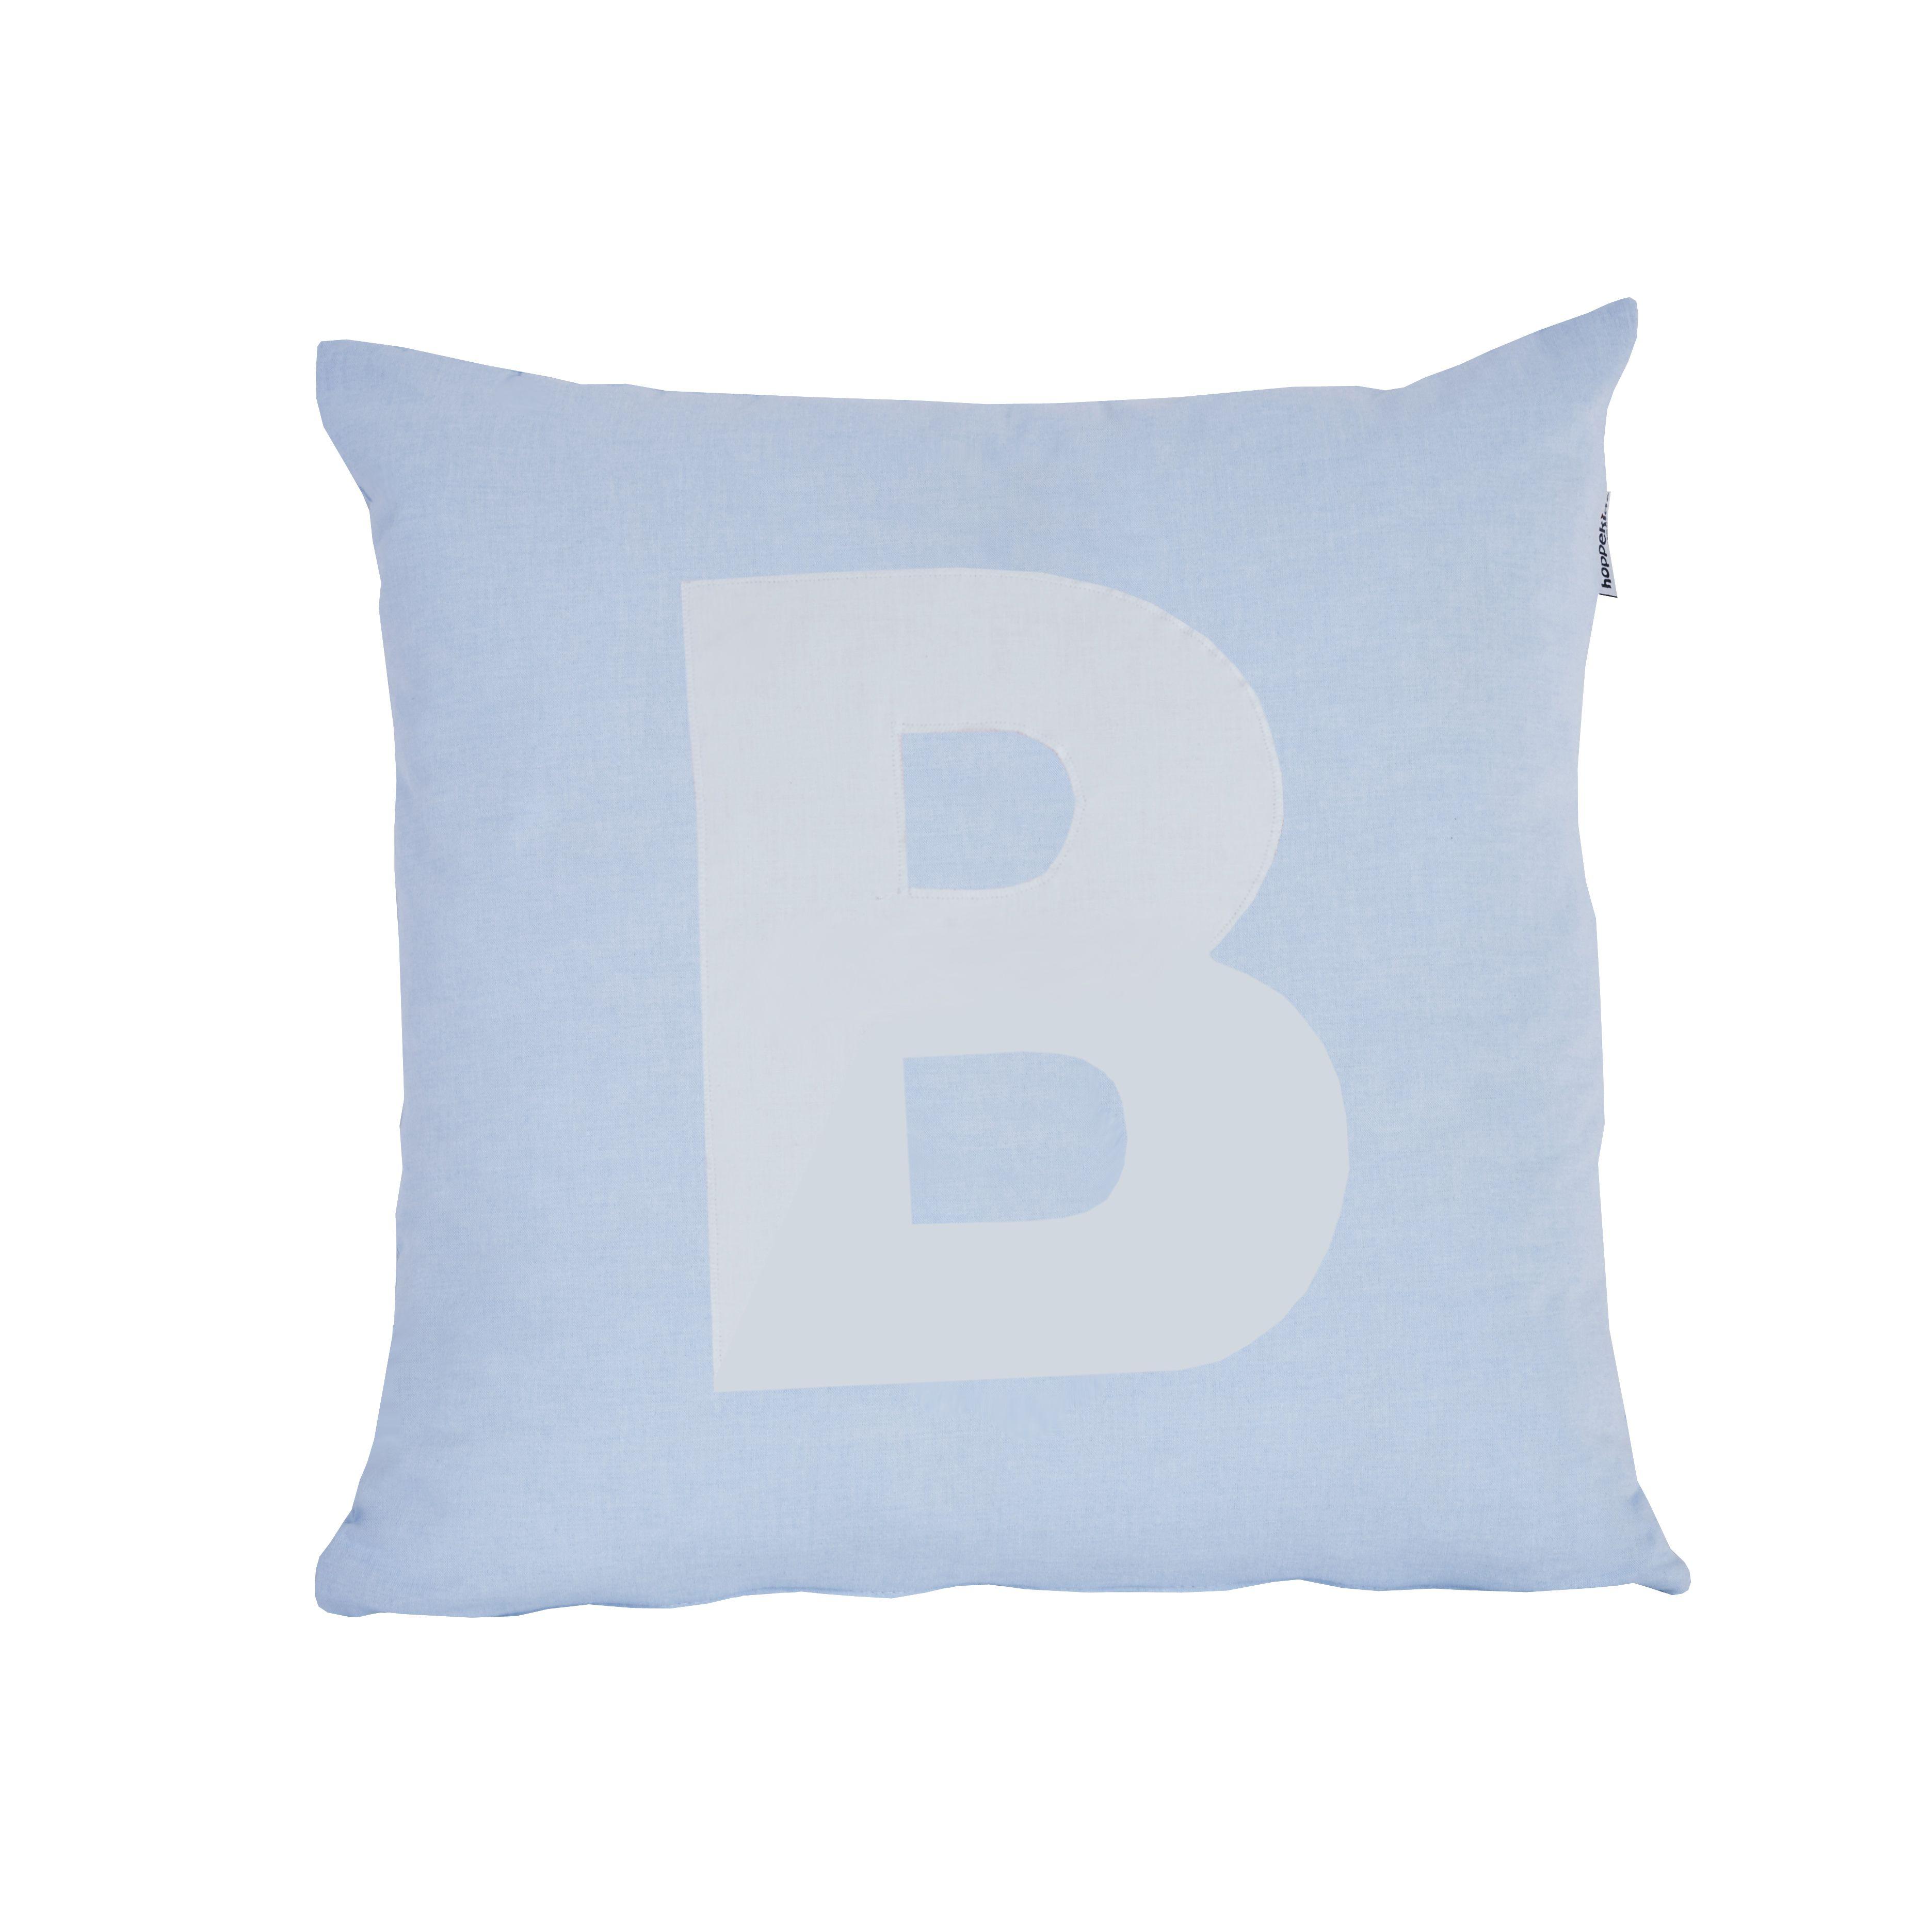 Pude Alphabet B lyseblå fra Hoppekids